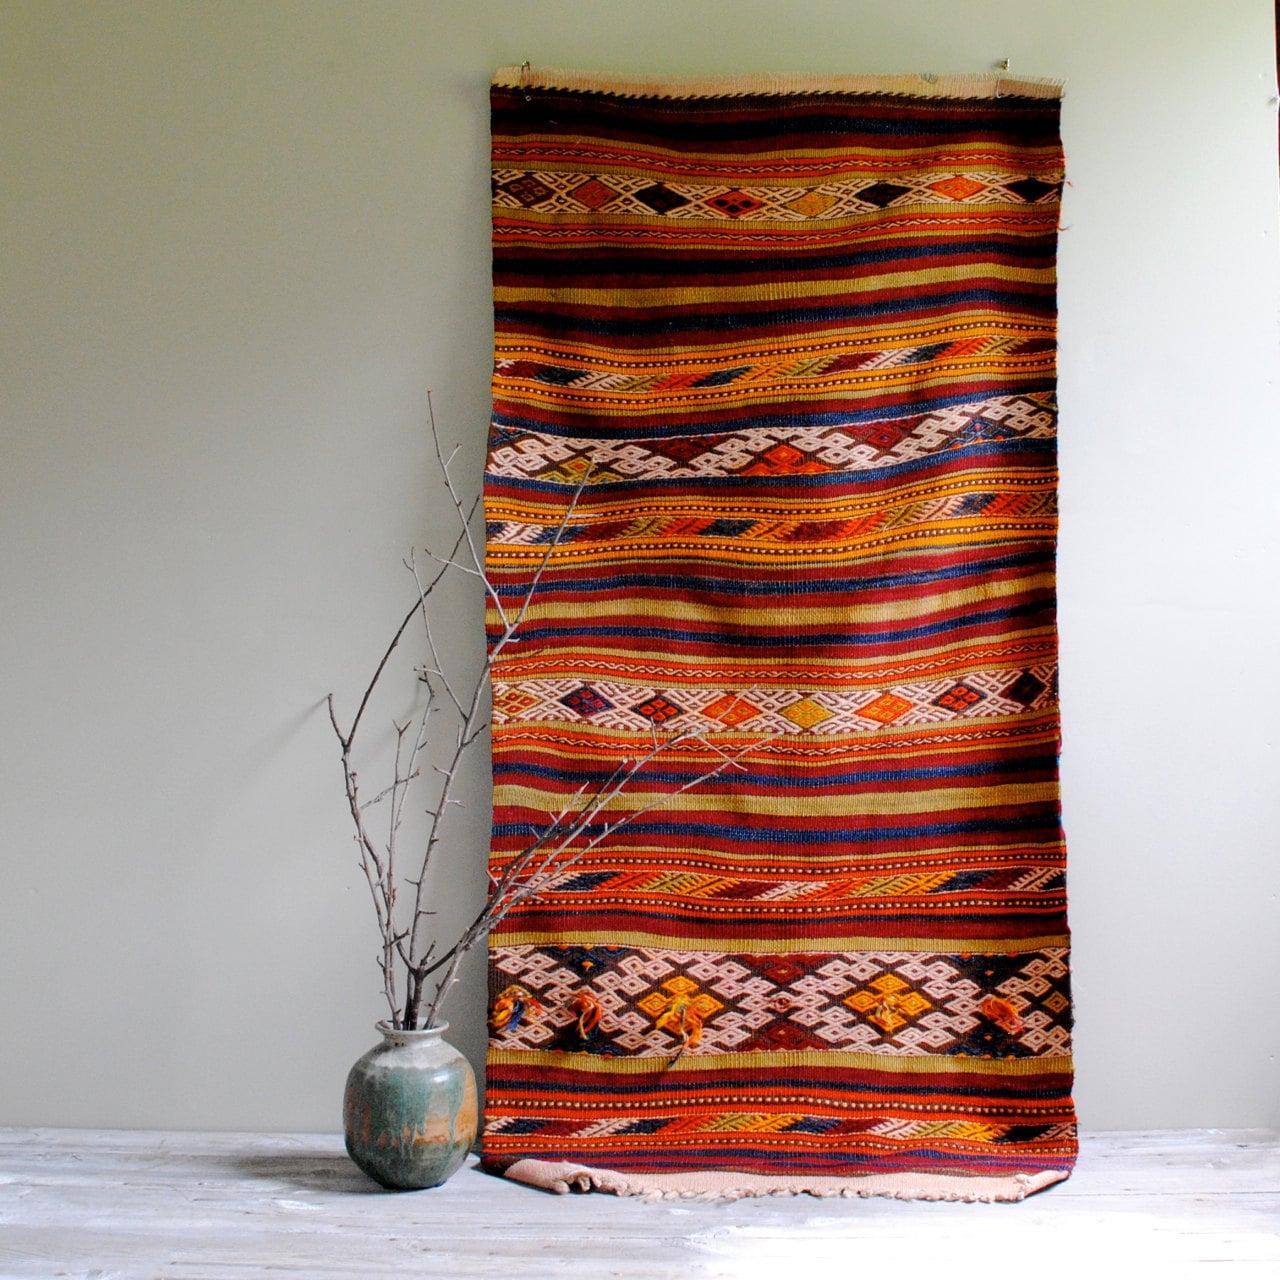 Vintage Turkish Kilim Rug From Sivas City / 5' X 2.5